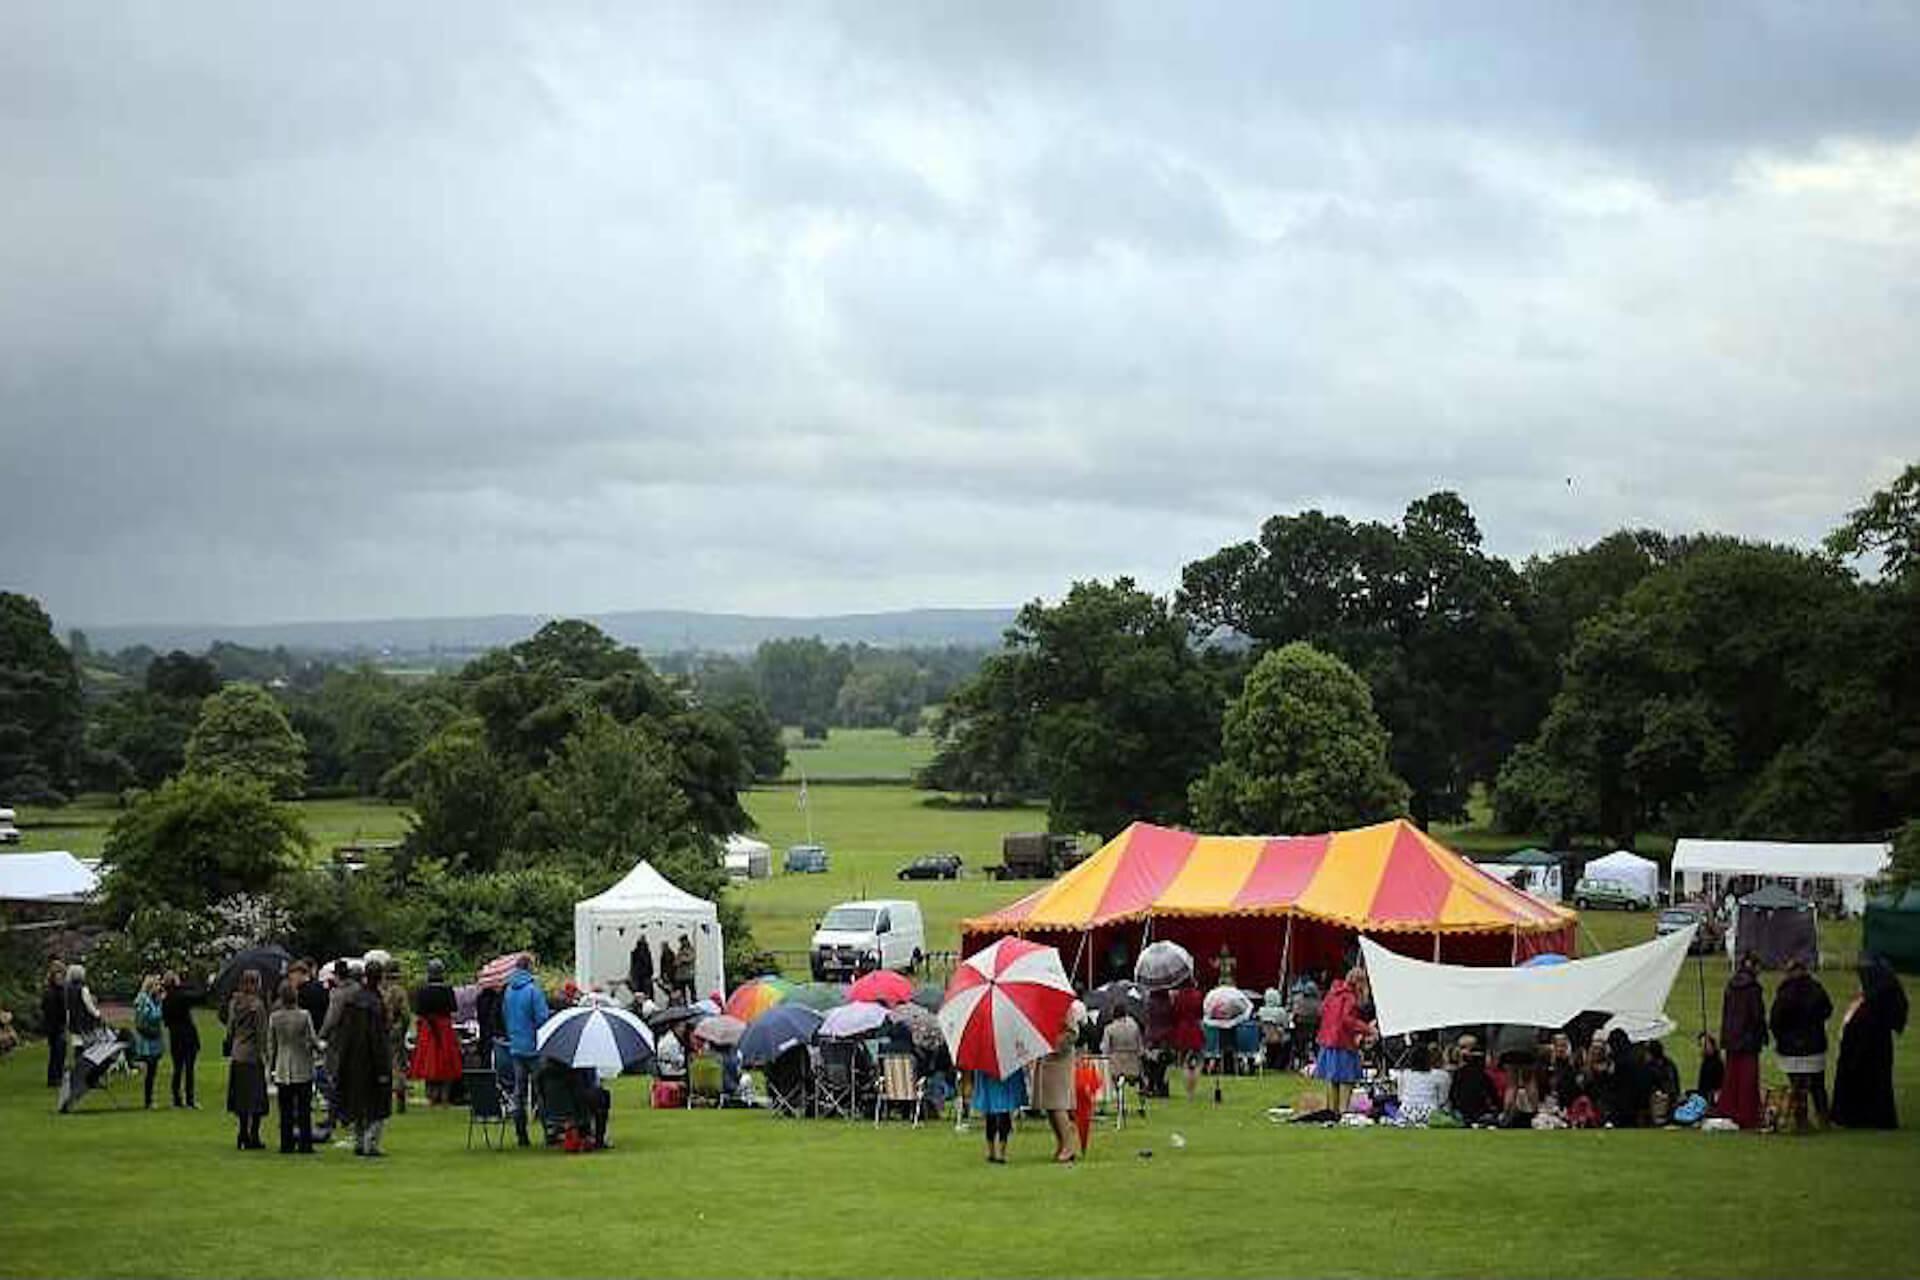 National Trust event at Killerton house in Devon